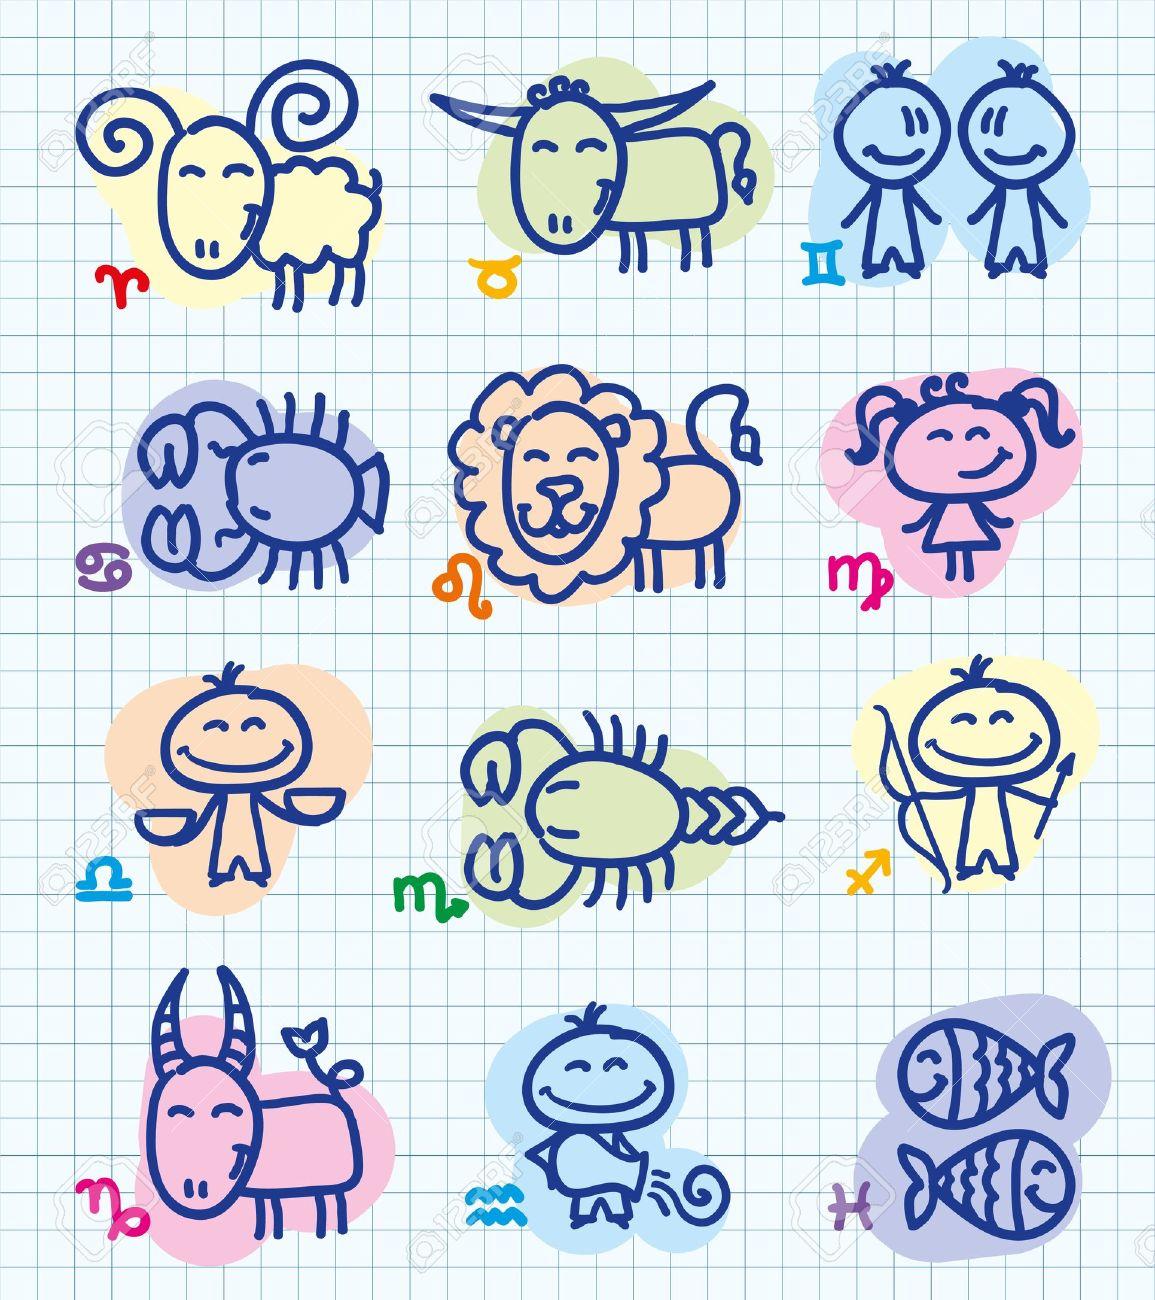 GAMBAR KARTUN ZODIAK LUCU DP Horoskop Funny Zodiacs Animasi